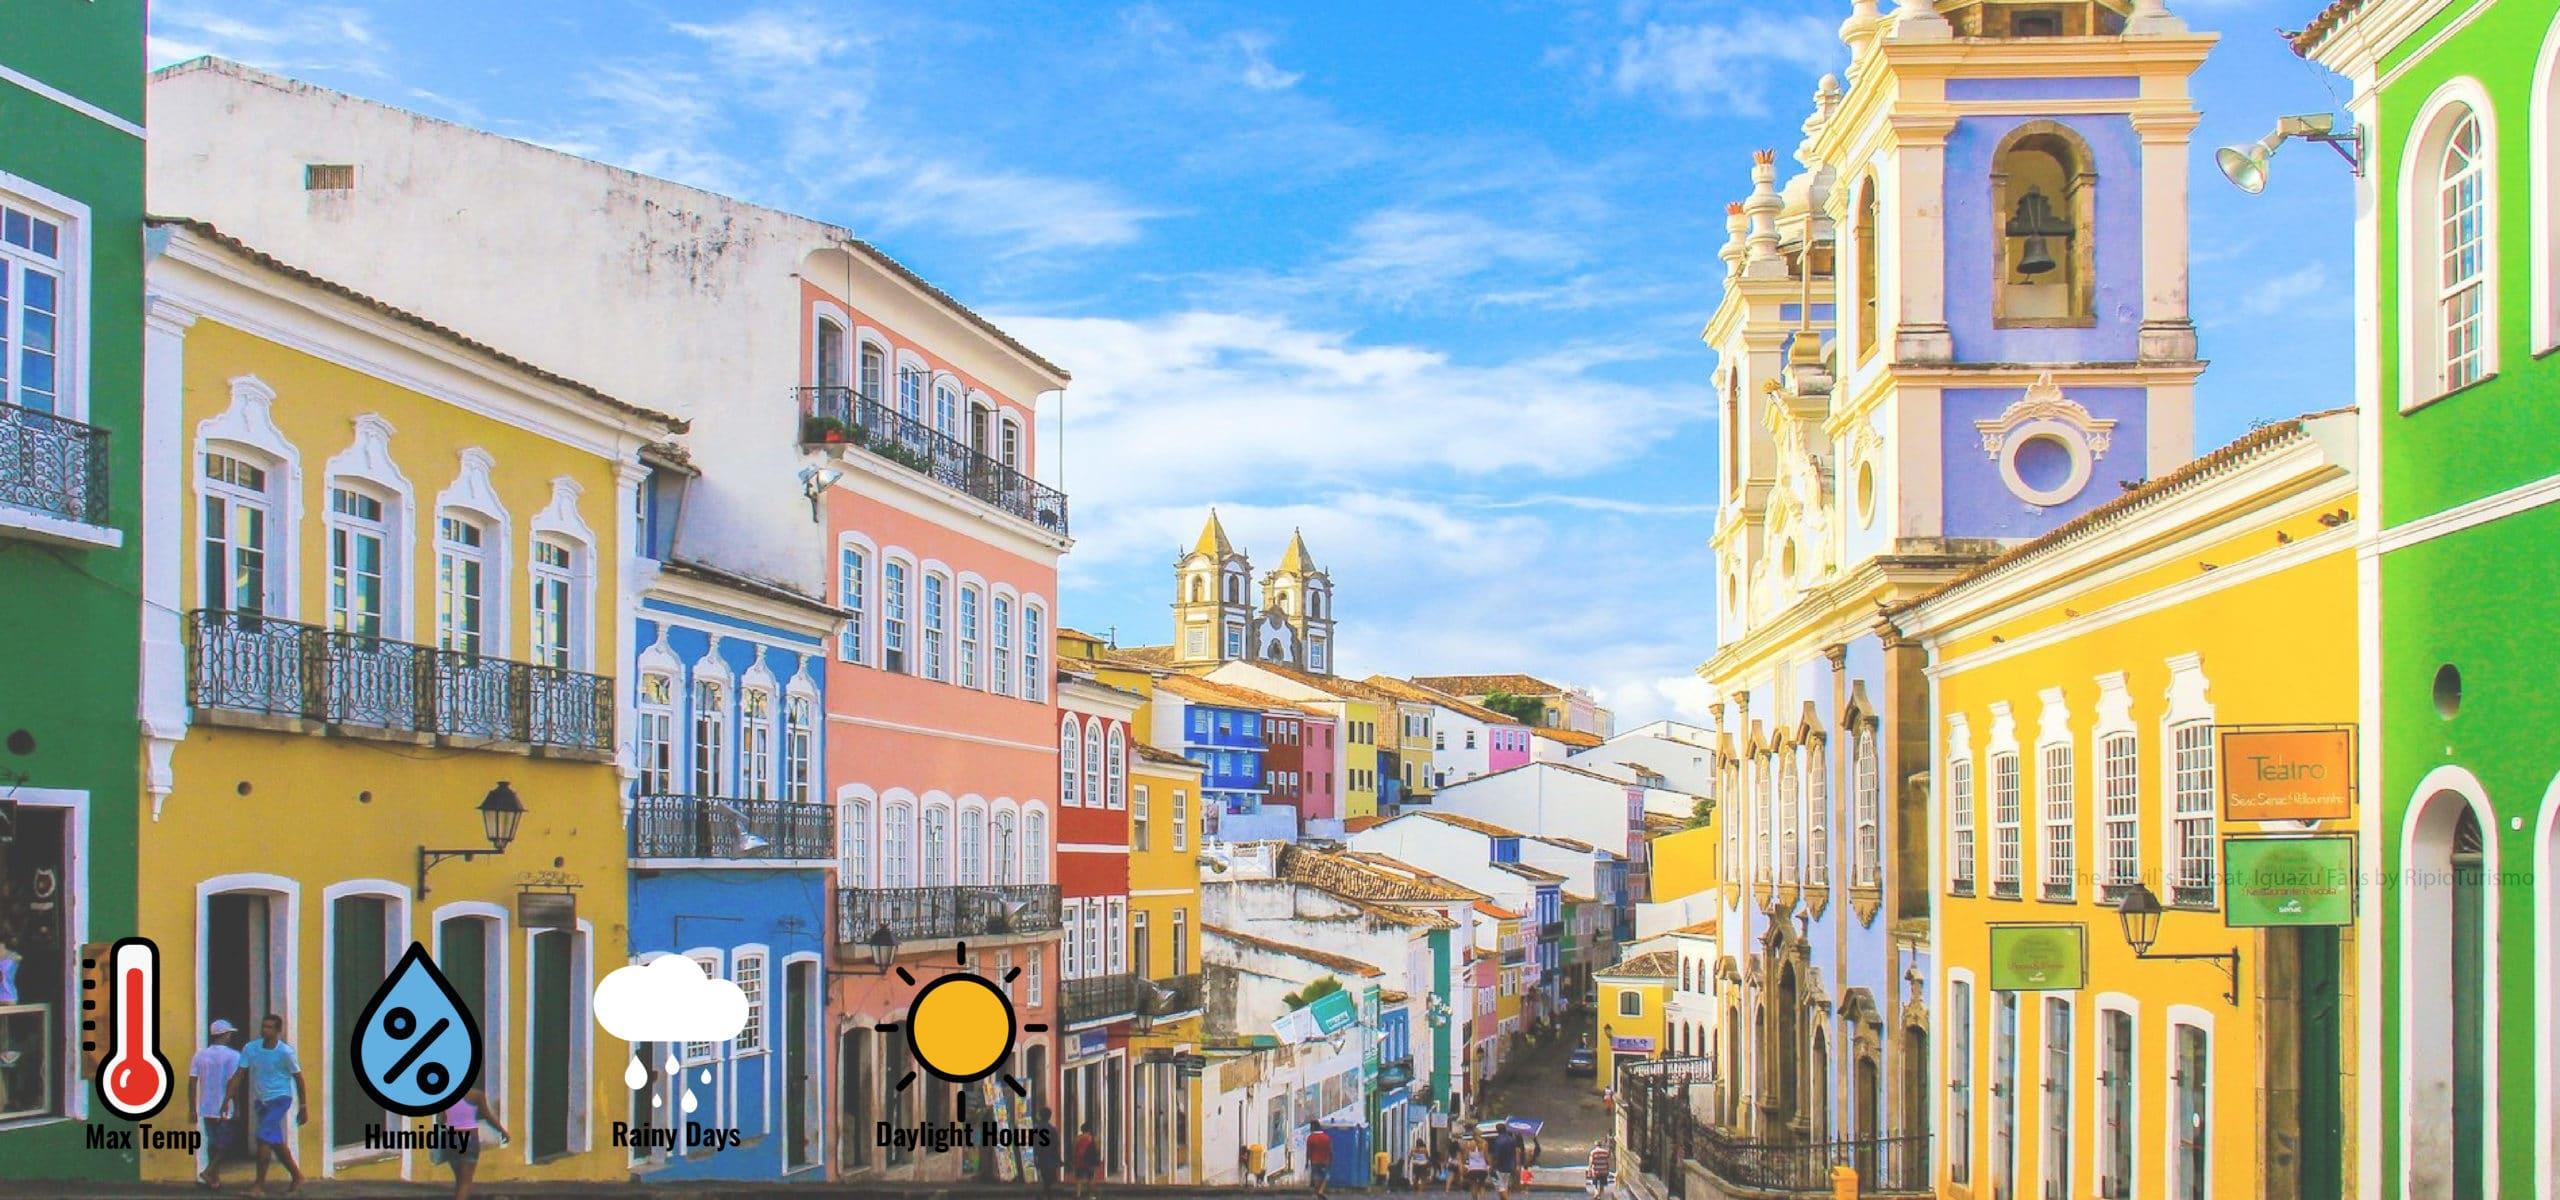 Weather in Salvador de Bahia. When to go to Salvador? RipioTurismo DMC for Brazil